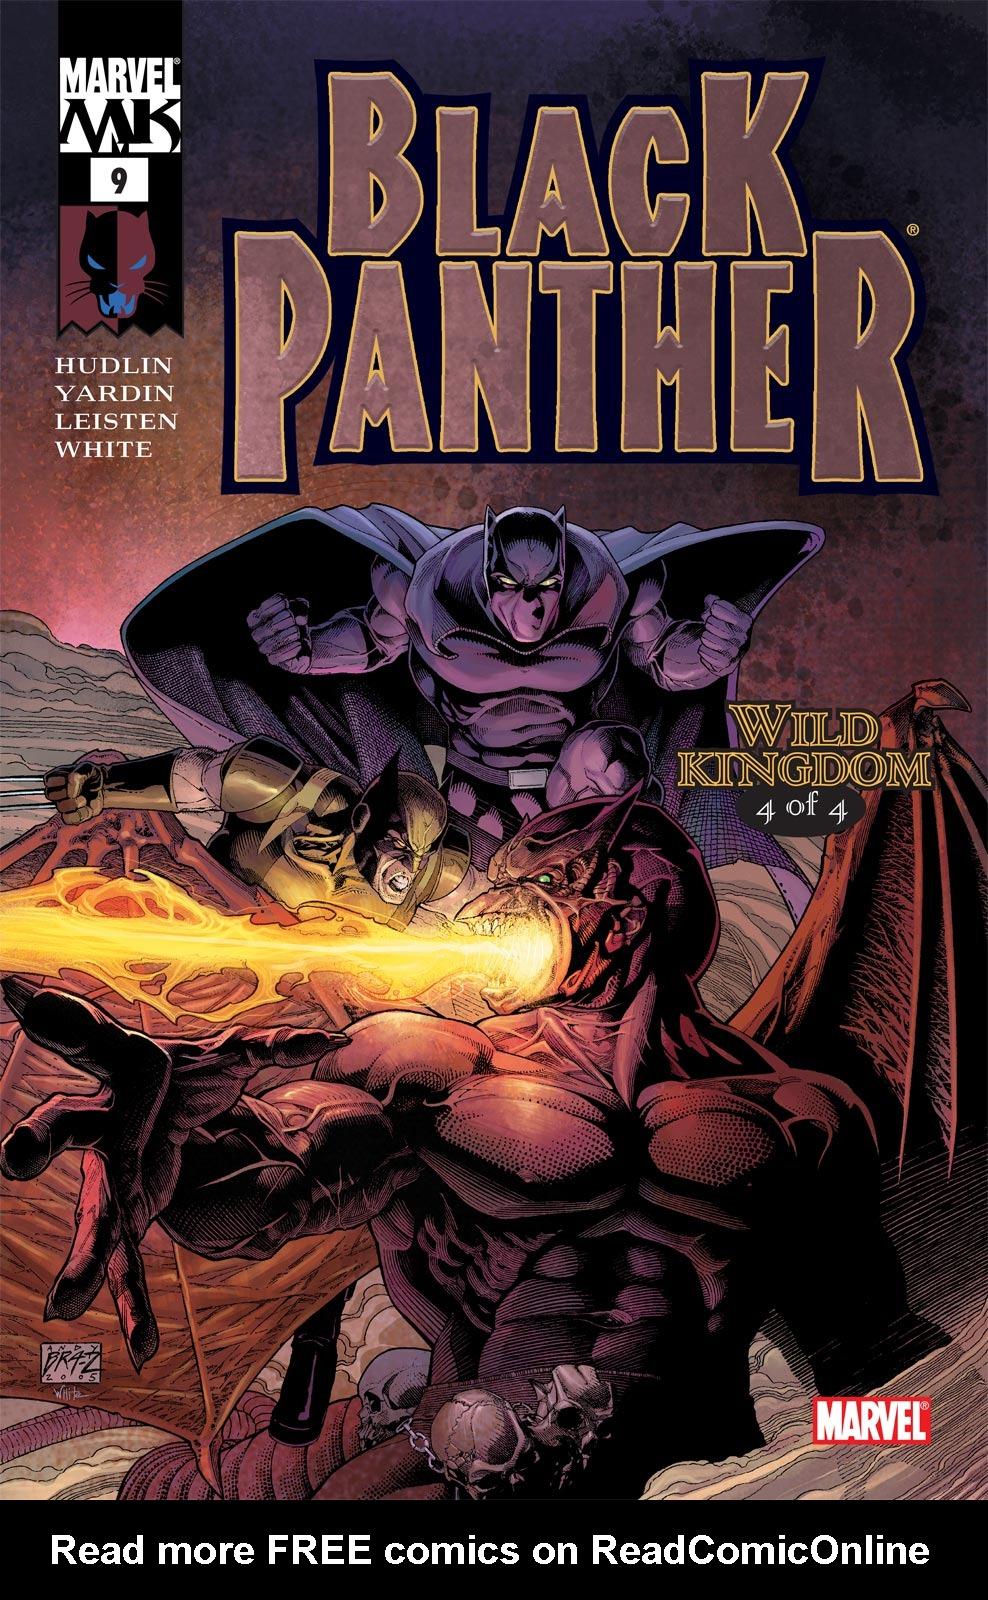 Black Panther (2005) 9 Page 1